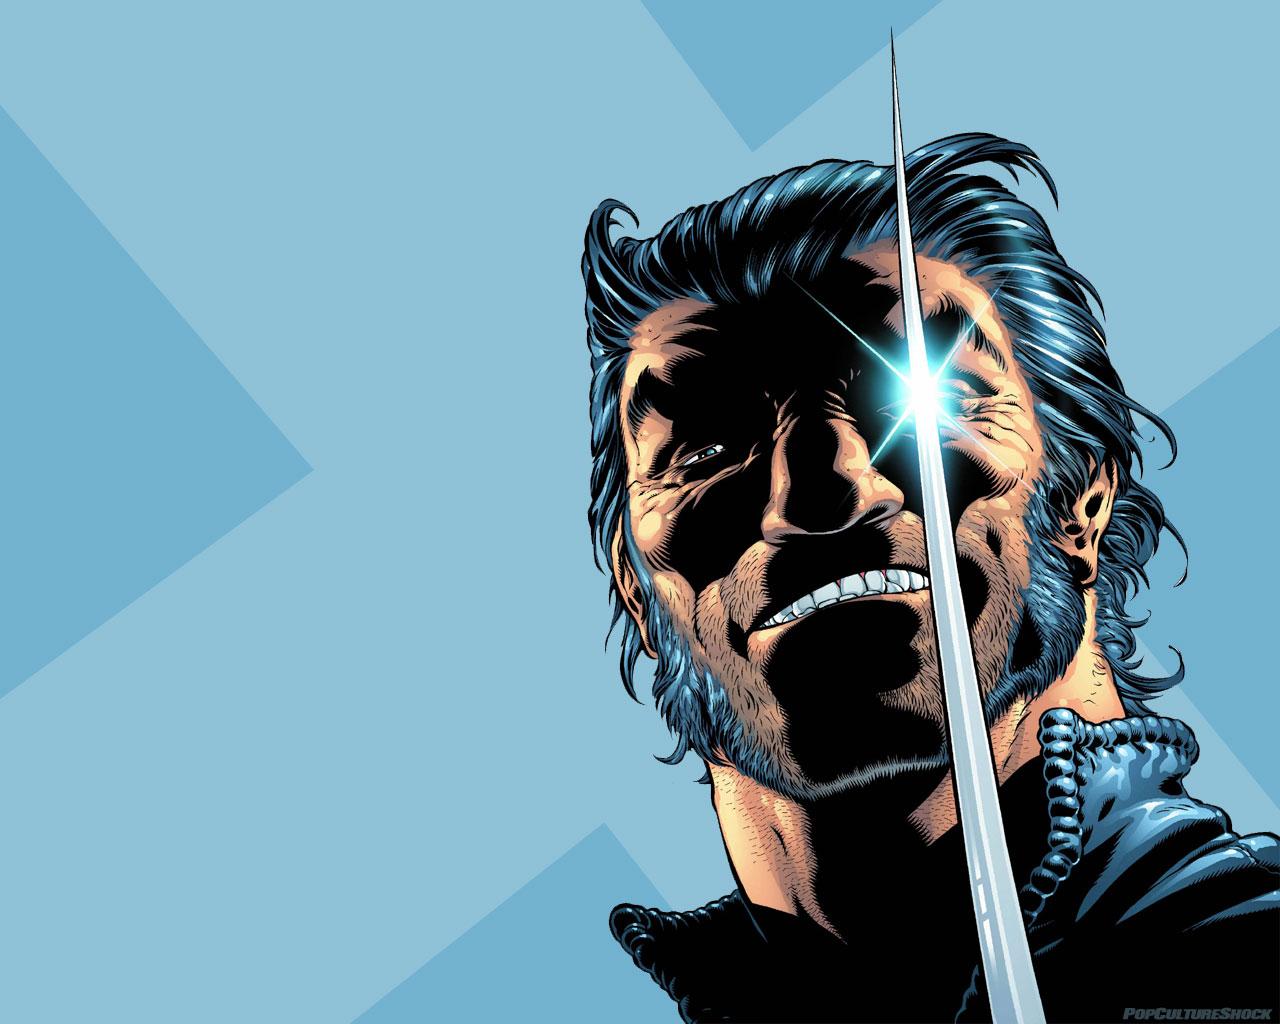 General 1280x1024 X-Men Marvel Comics Wolverine